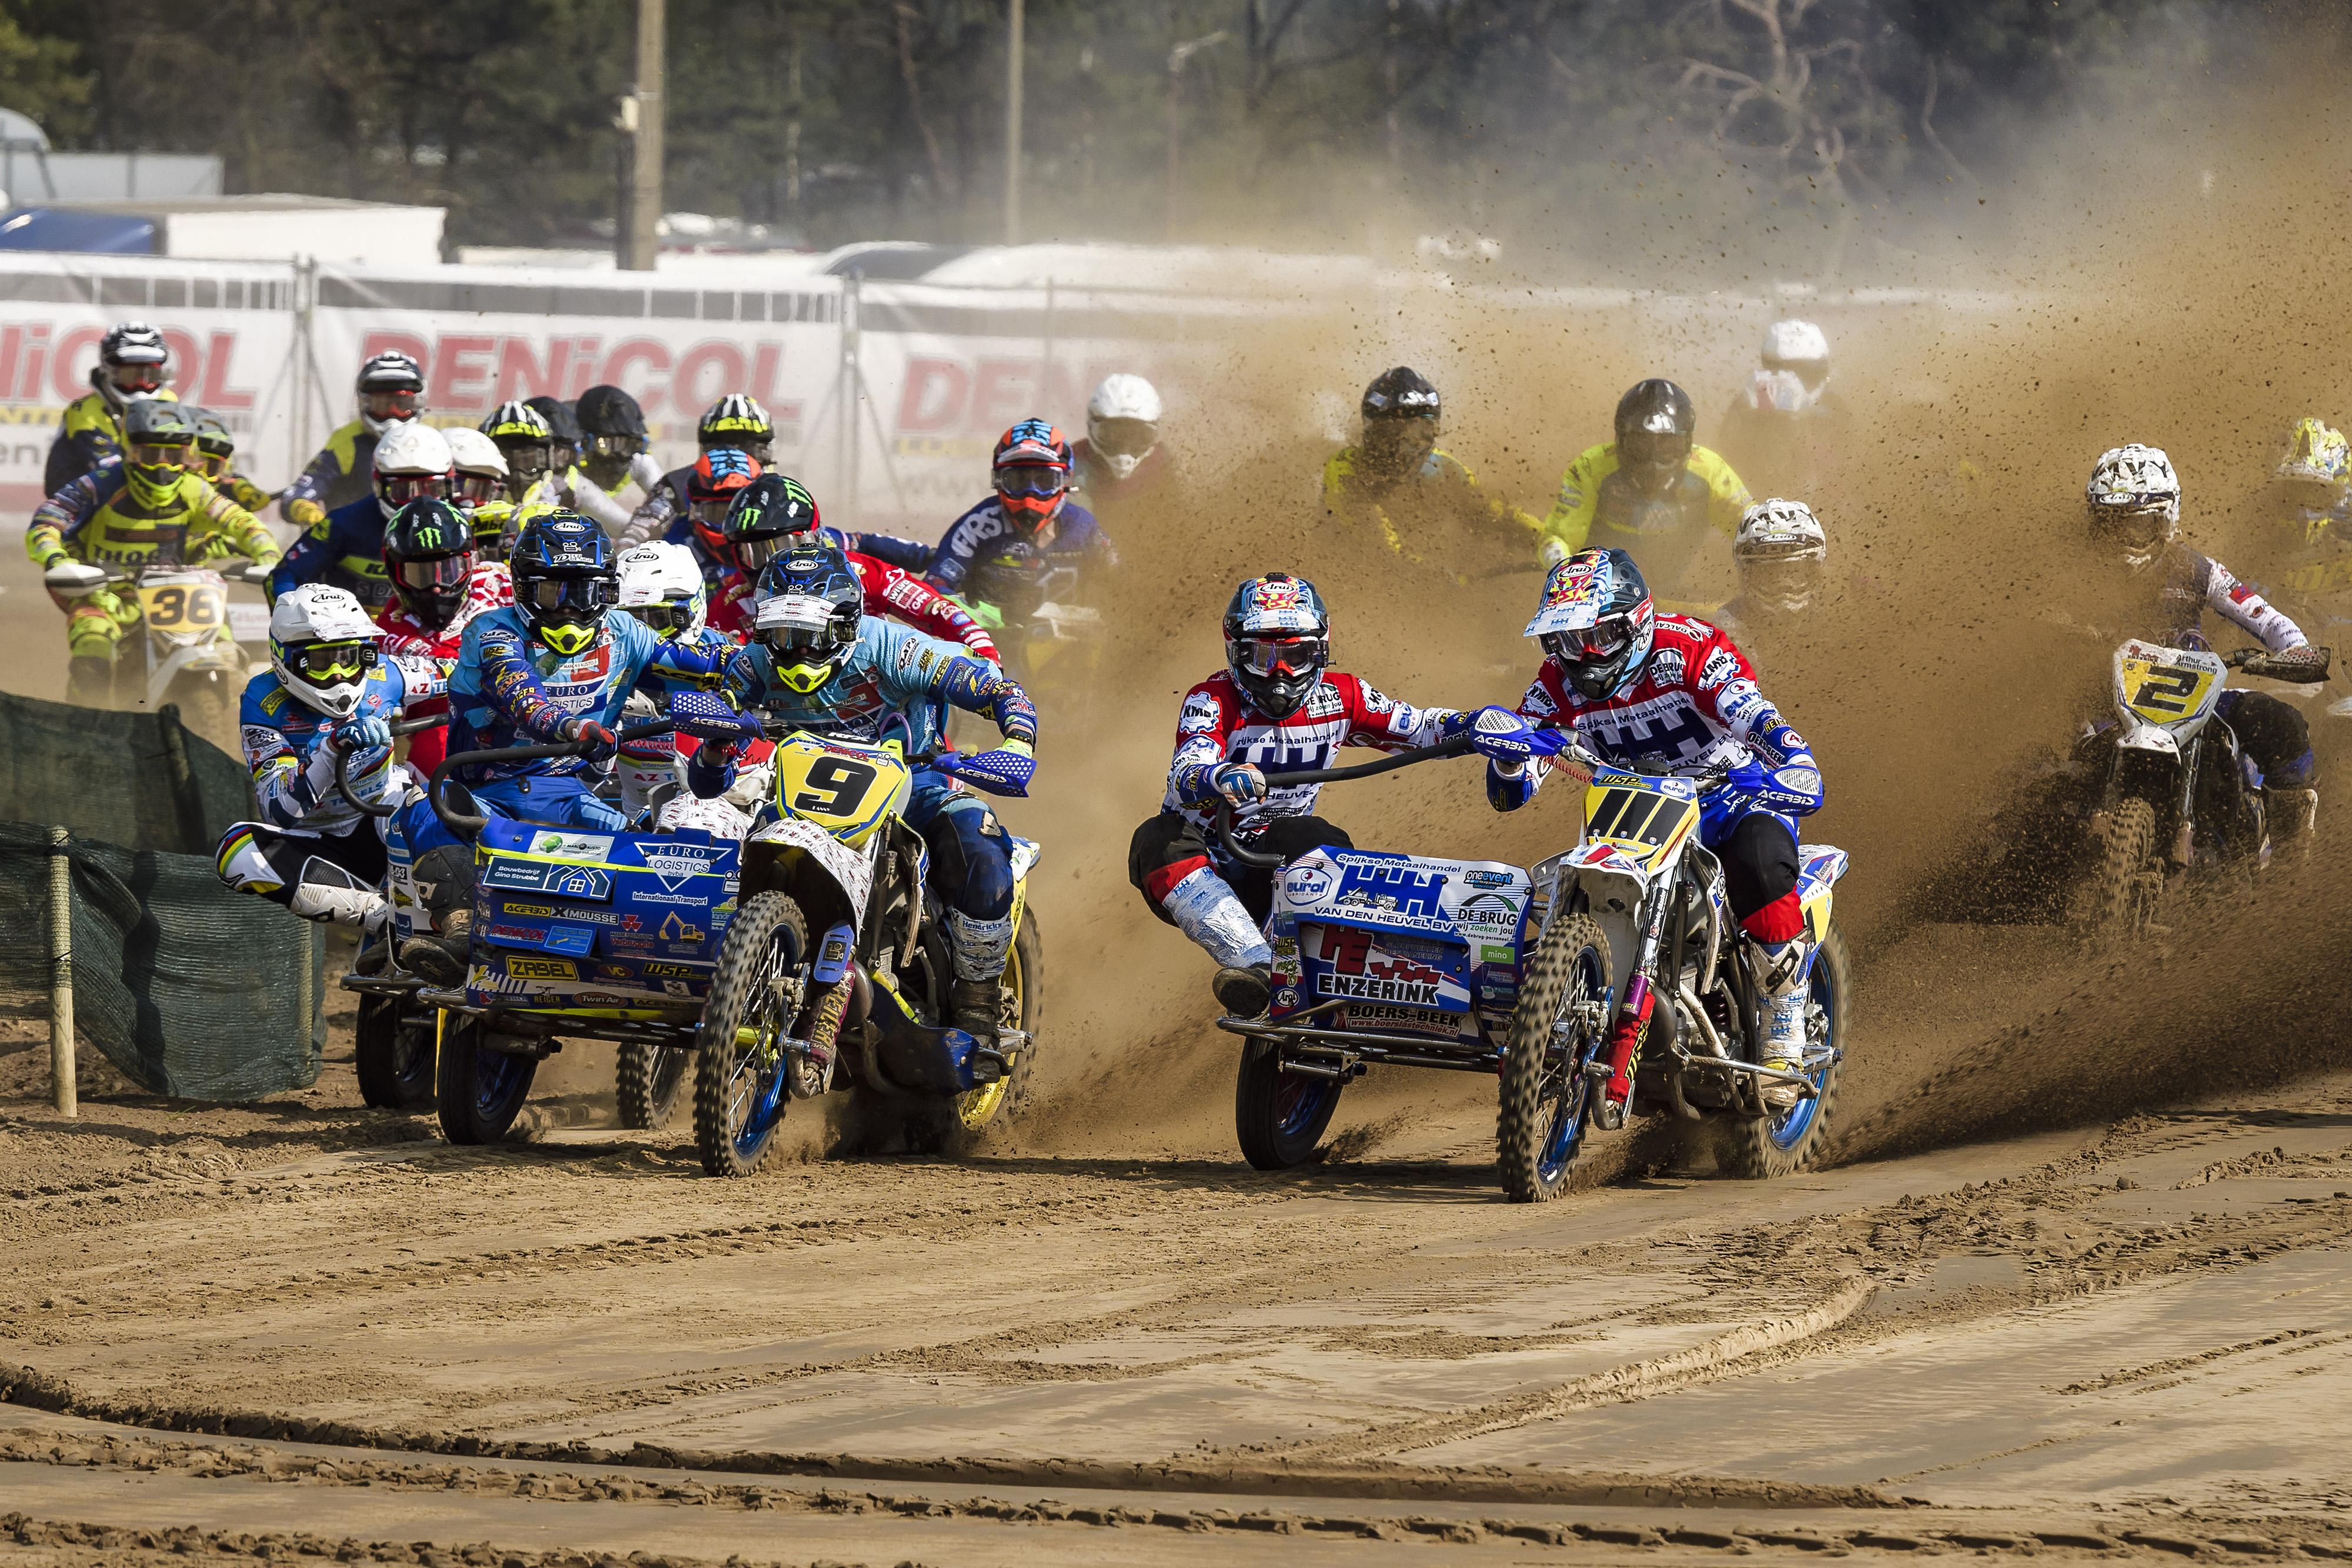 FIM Sidecar Motocross World Championship